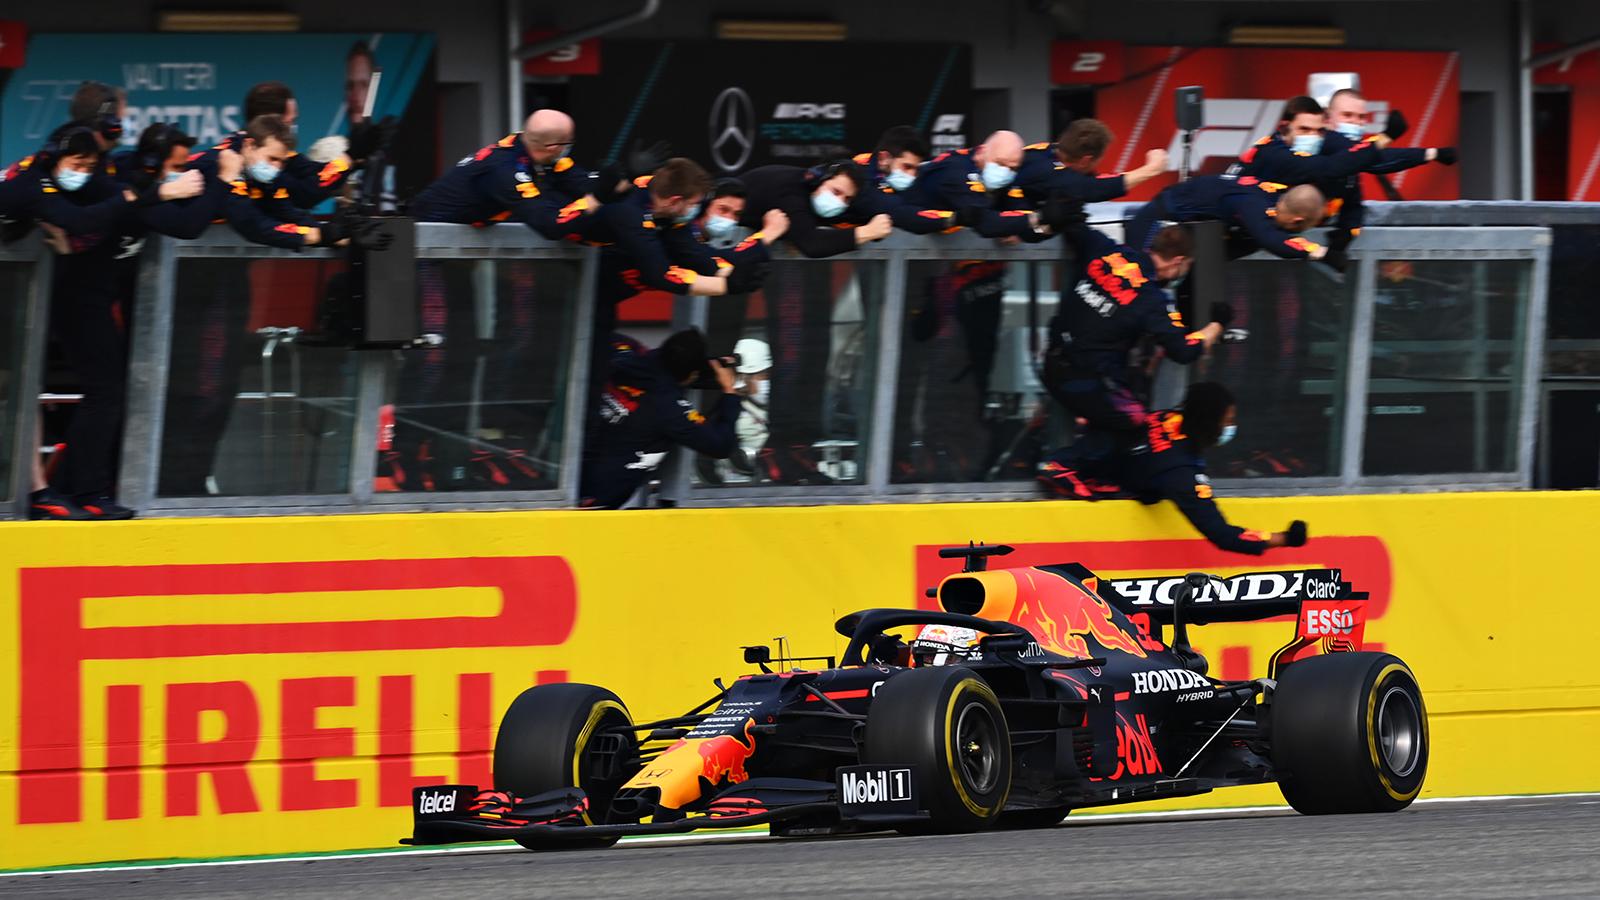 Verstappen mène sa RedBull à la victoire © RedBull Media